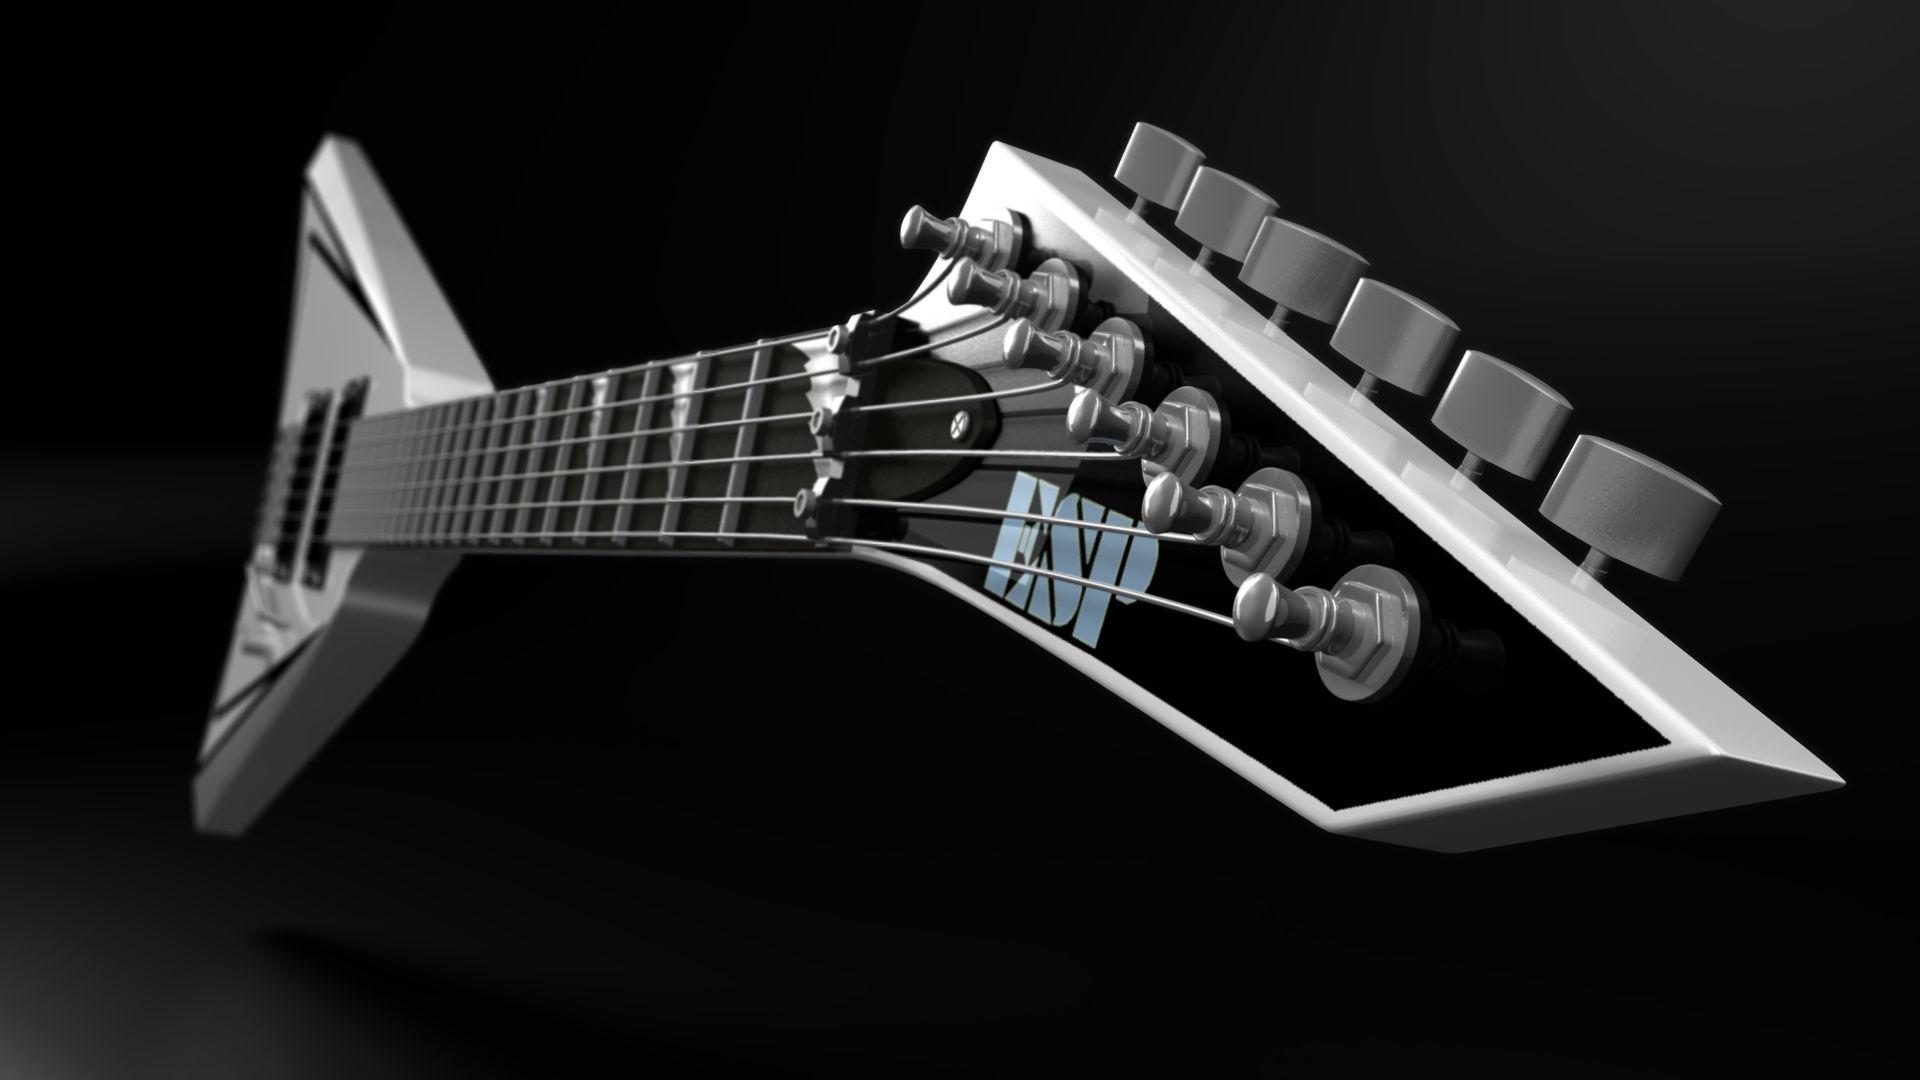 Electric Guitar, HD Desktop Wallpaper